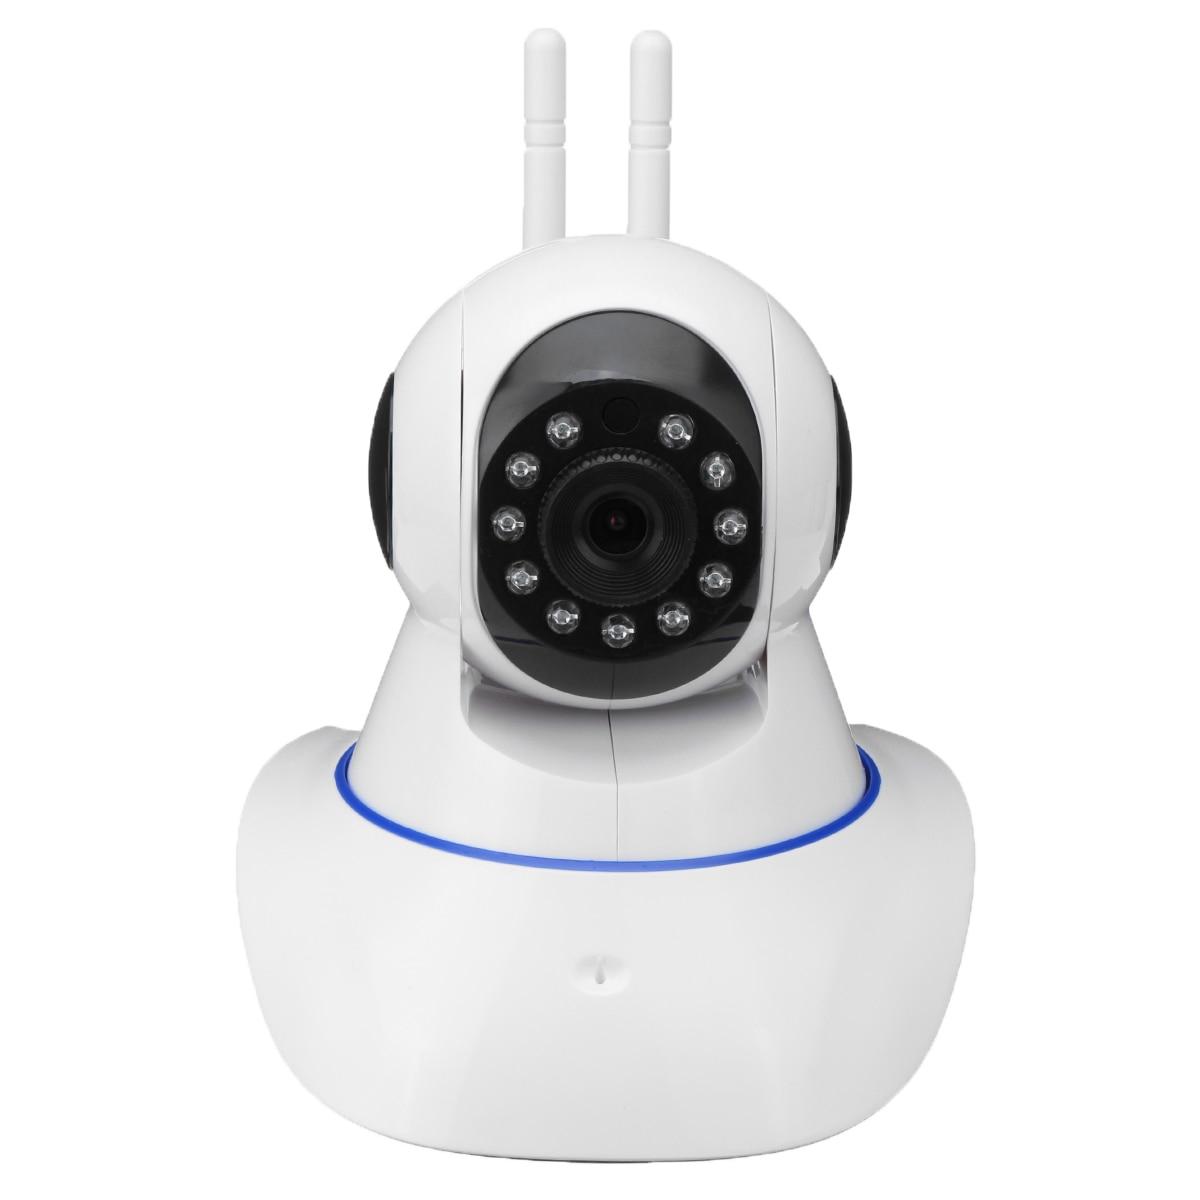 NEW Safurance 720P HD Wireless WiFi IP Home Security Network Camera Baby Monitor CCTV IR Night Vision Safety Surveillance safurance mini wireless network wifi ip camera security nanny night vision cam surveillance home security